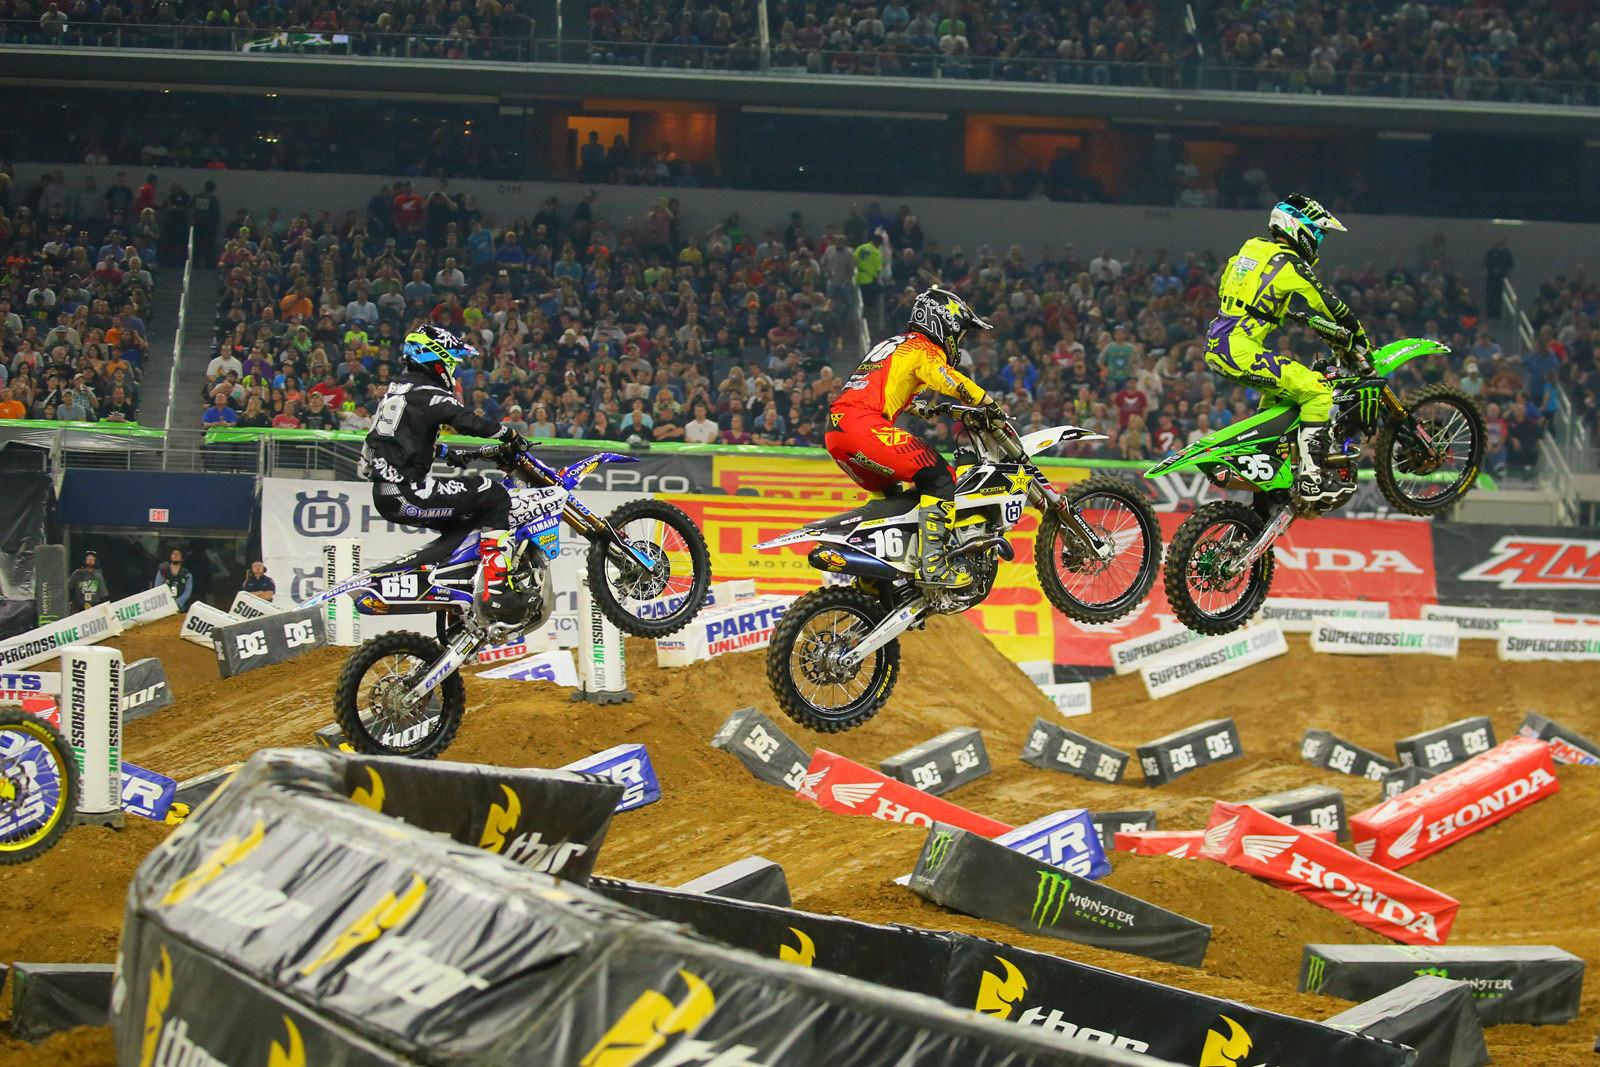 Chris Alldredge, Zach Osborne, and Colt Nichols - Photo Blast: Arlington - Motocross Pictures - Vital MX